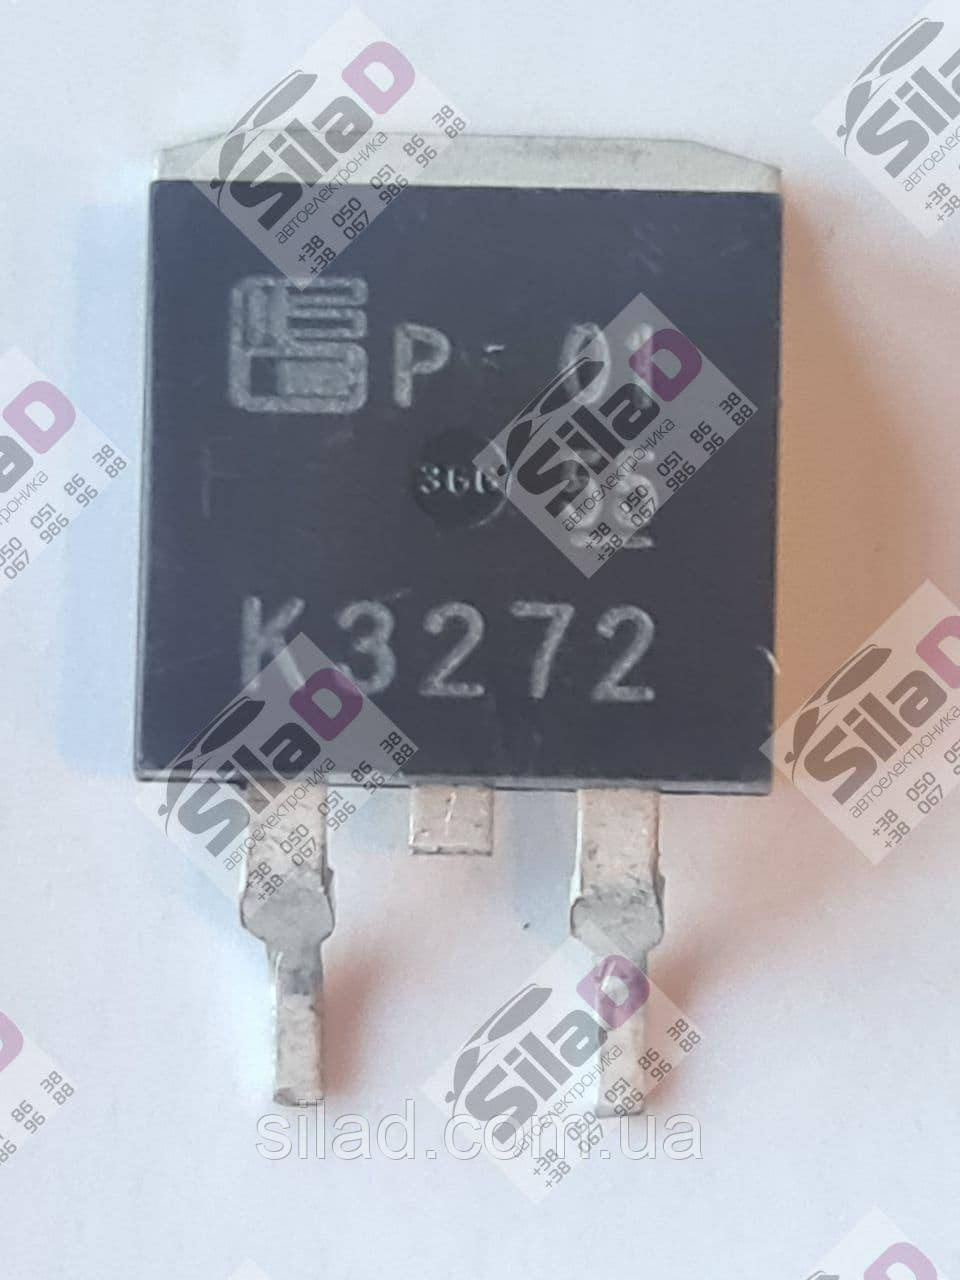 Транзистор 2SK3272 K3272 Fuji Electric корпус TO-263